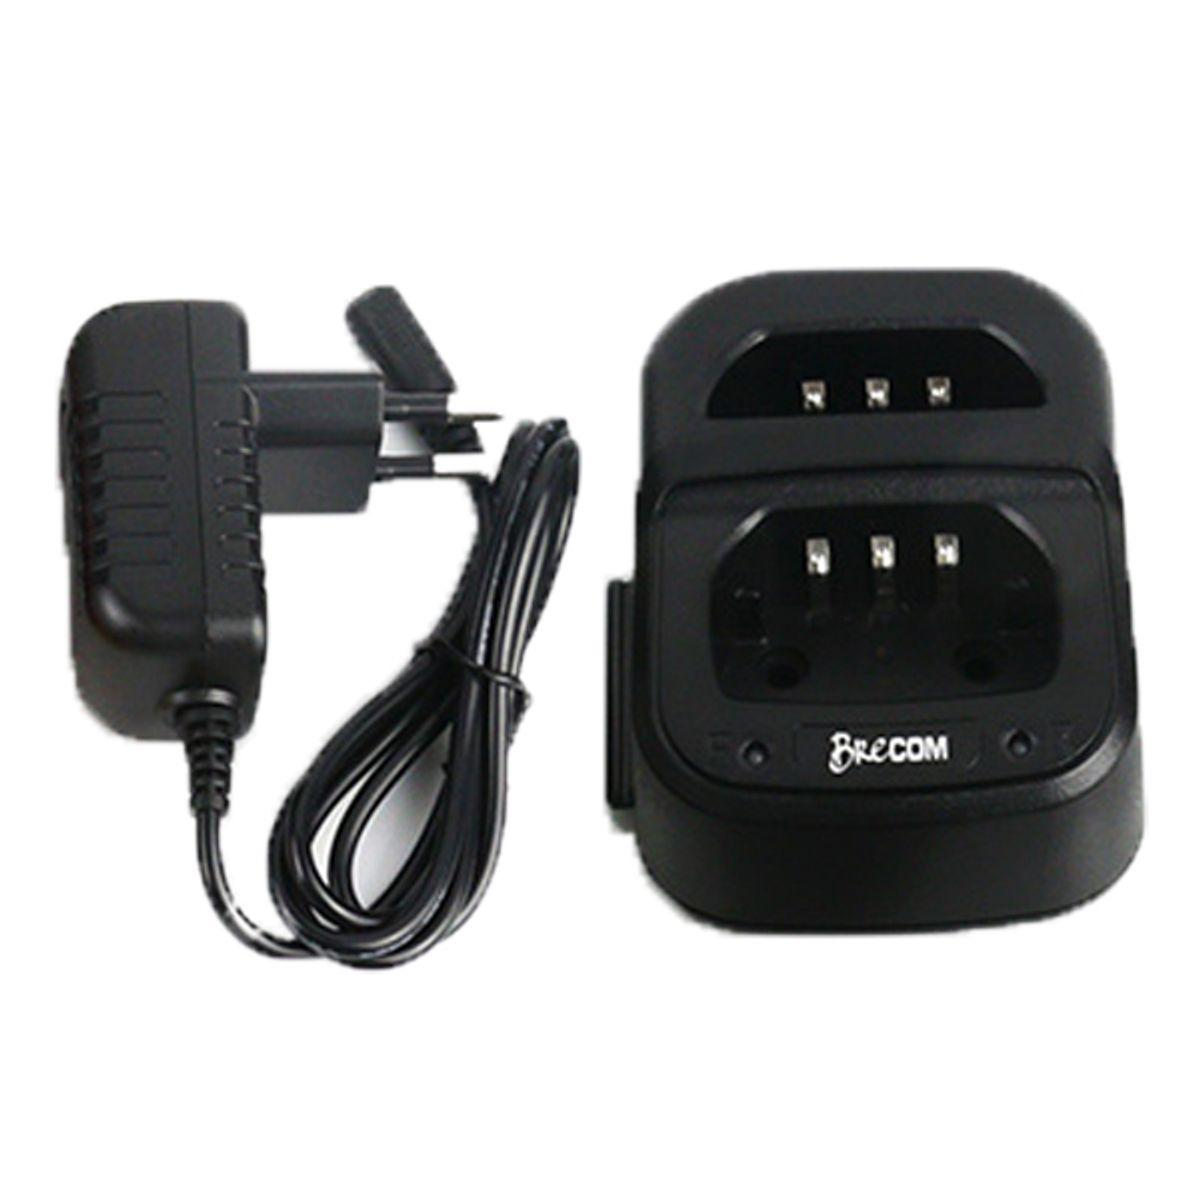 Brecom Bordlader VR-600D DMR